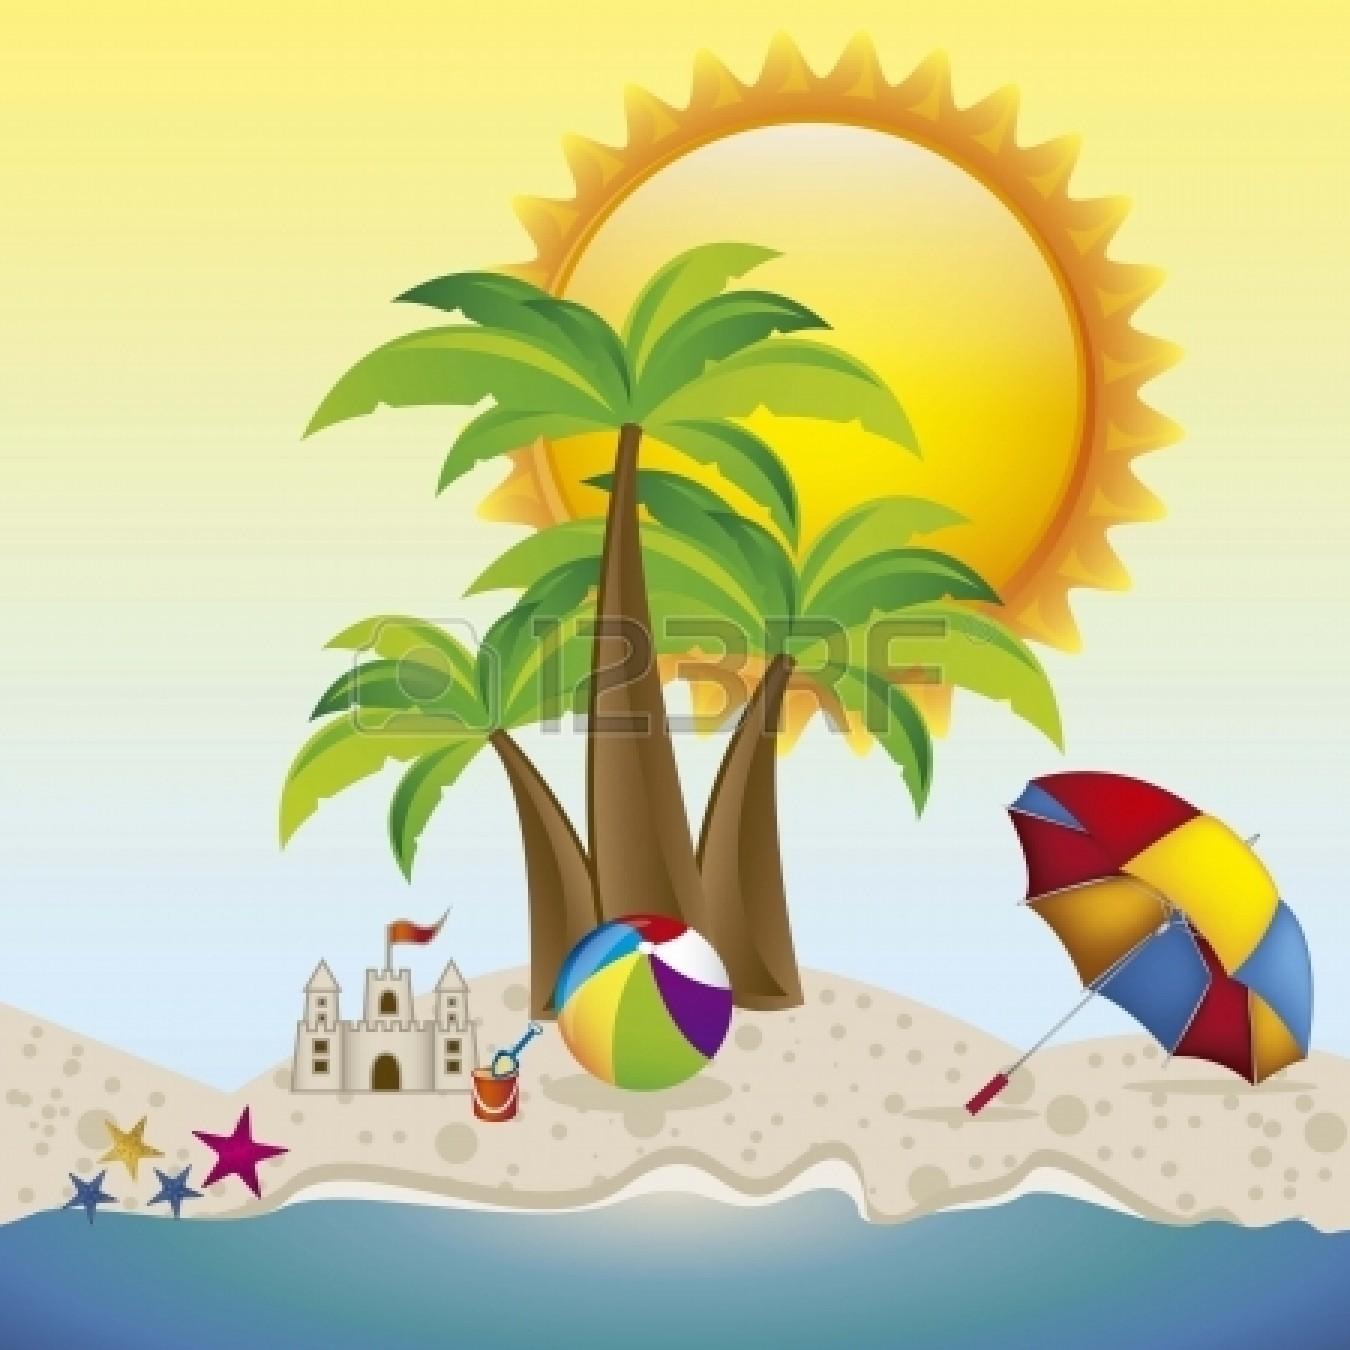 1350x1350 Beach Clipart Family Beach Vacation